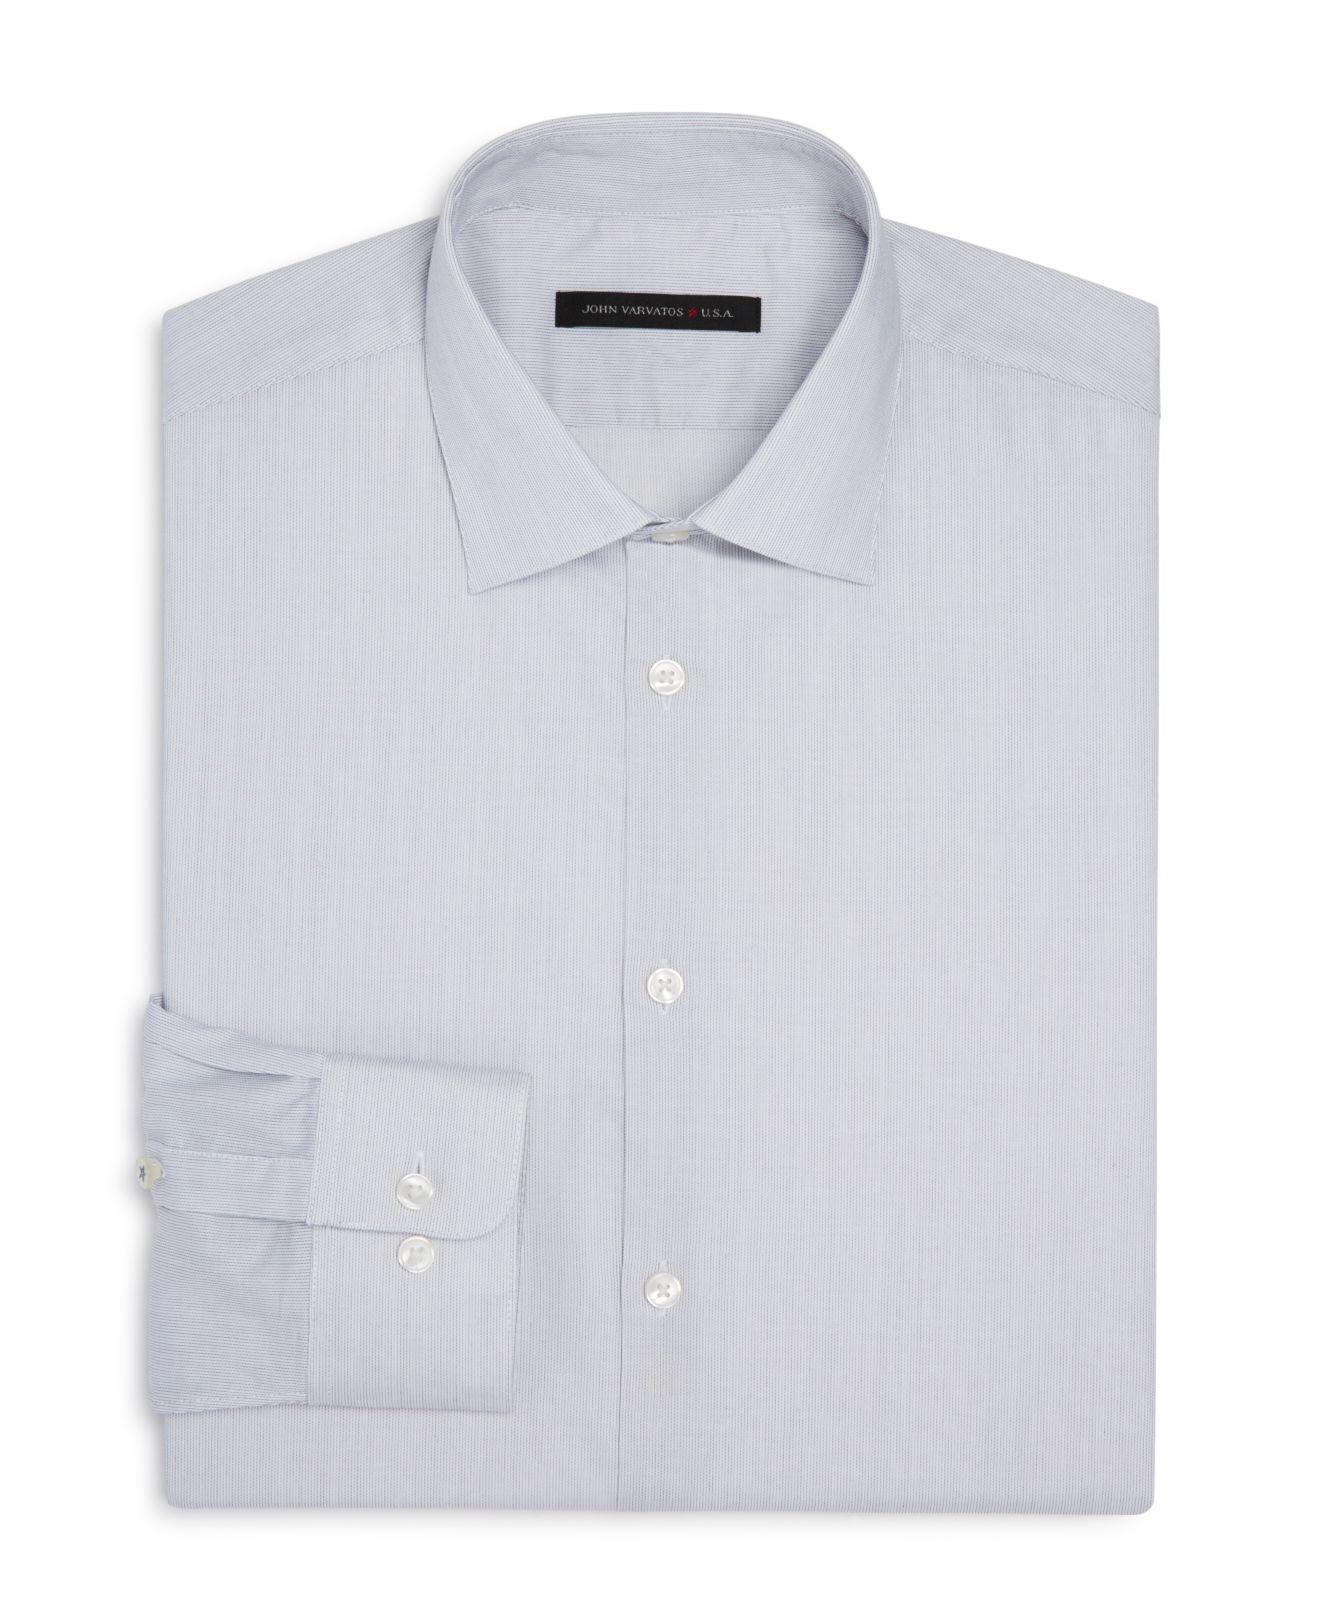 John varvatos micro stripe slim fit stretch dress shirt in for How to stretch a dress shirt